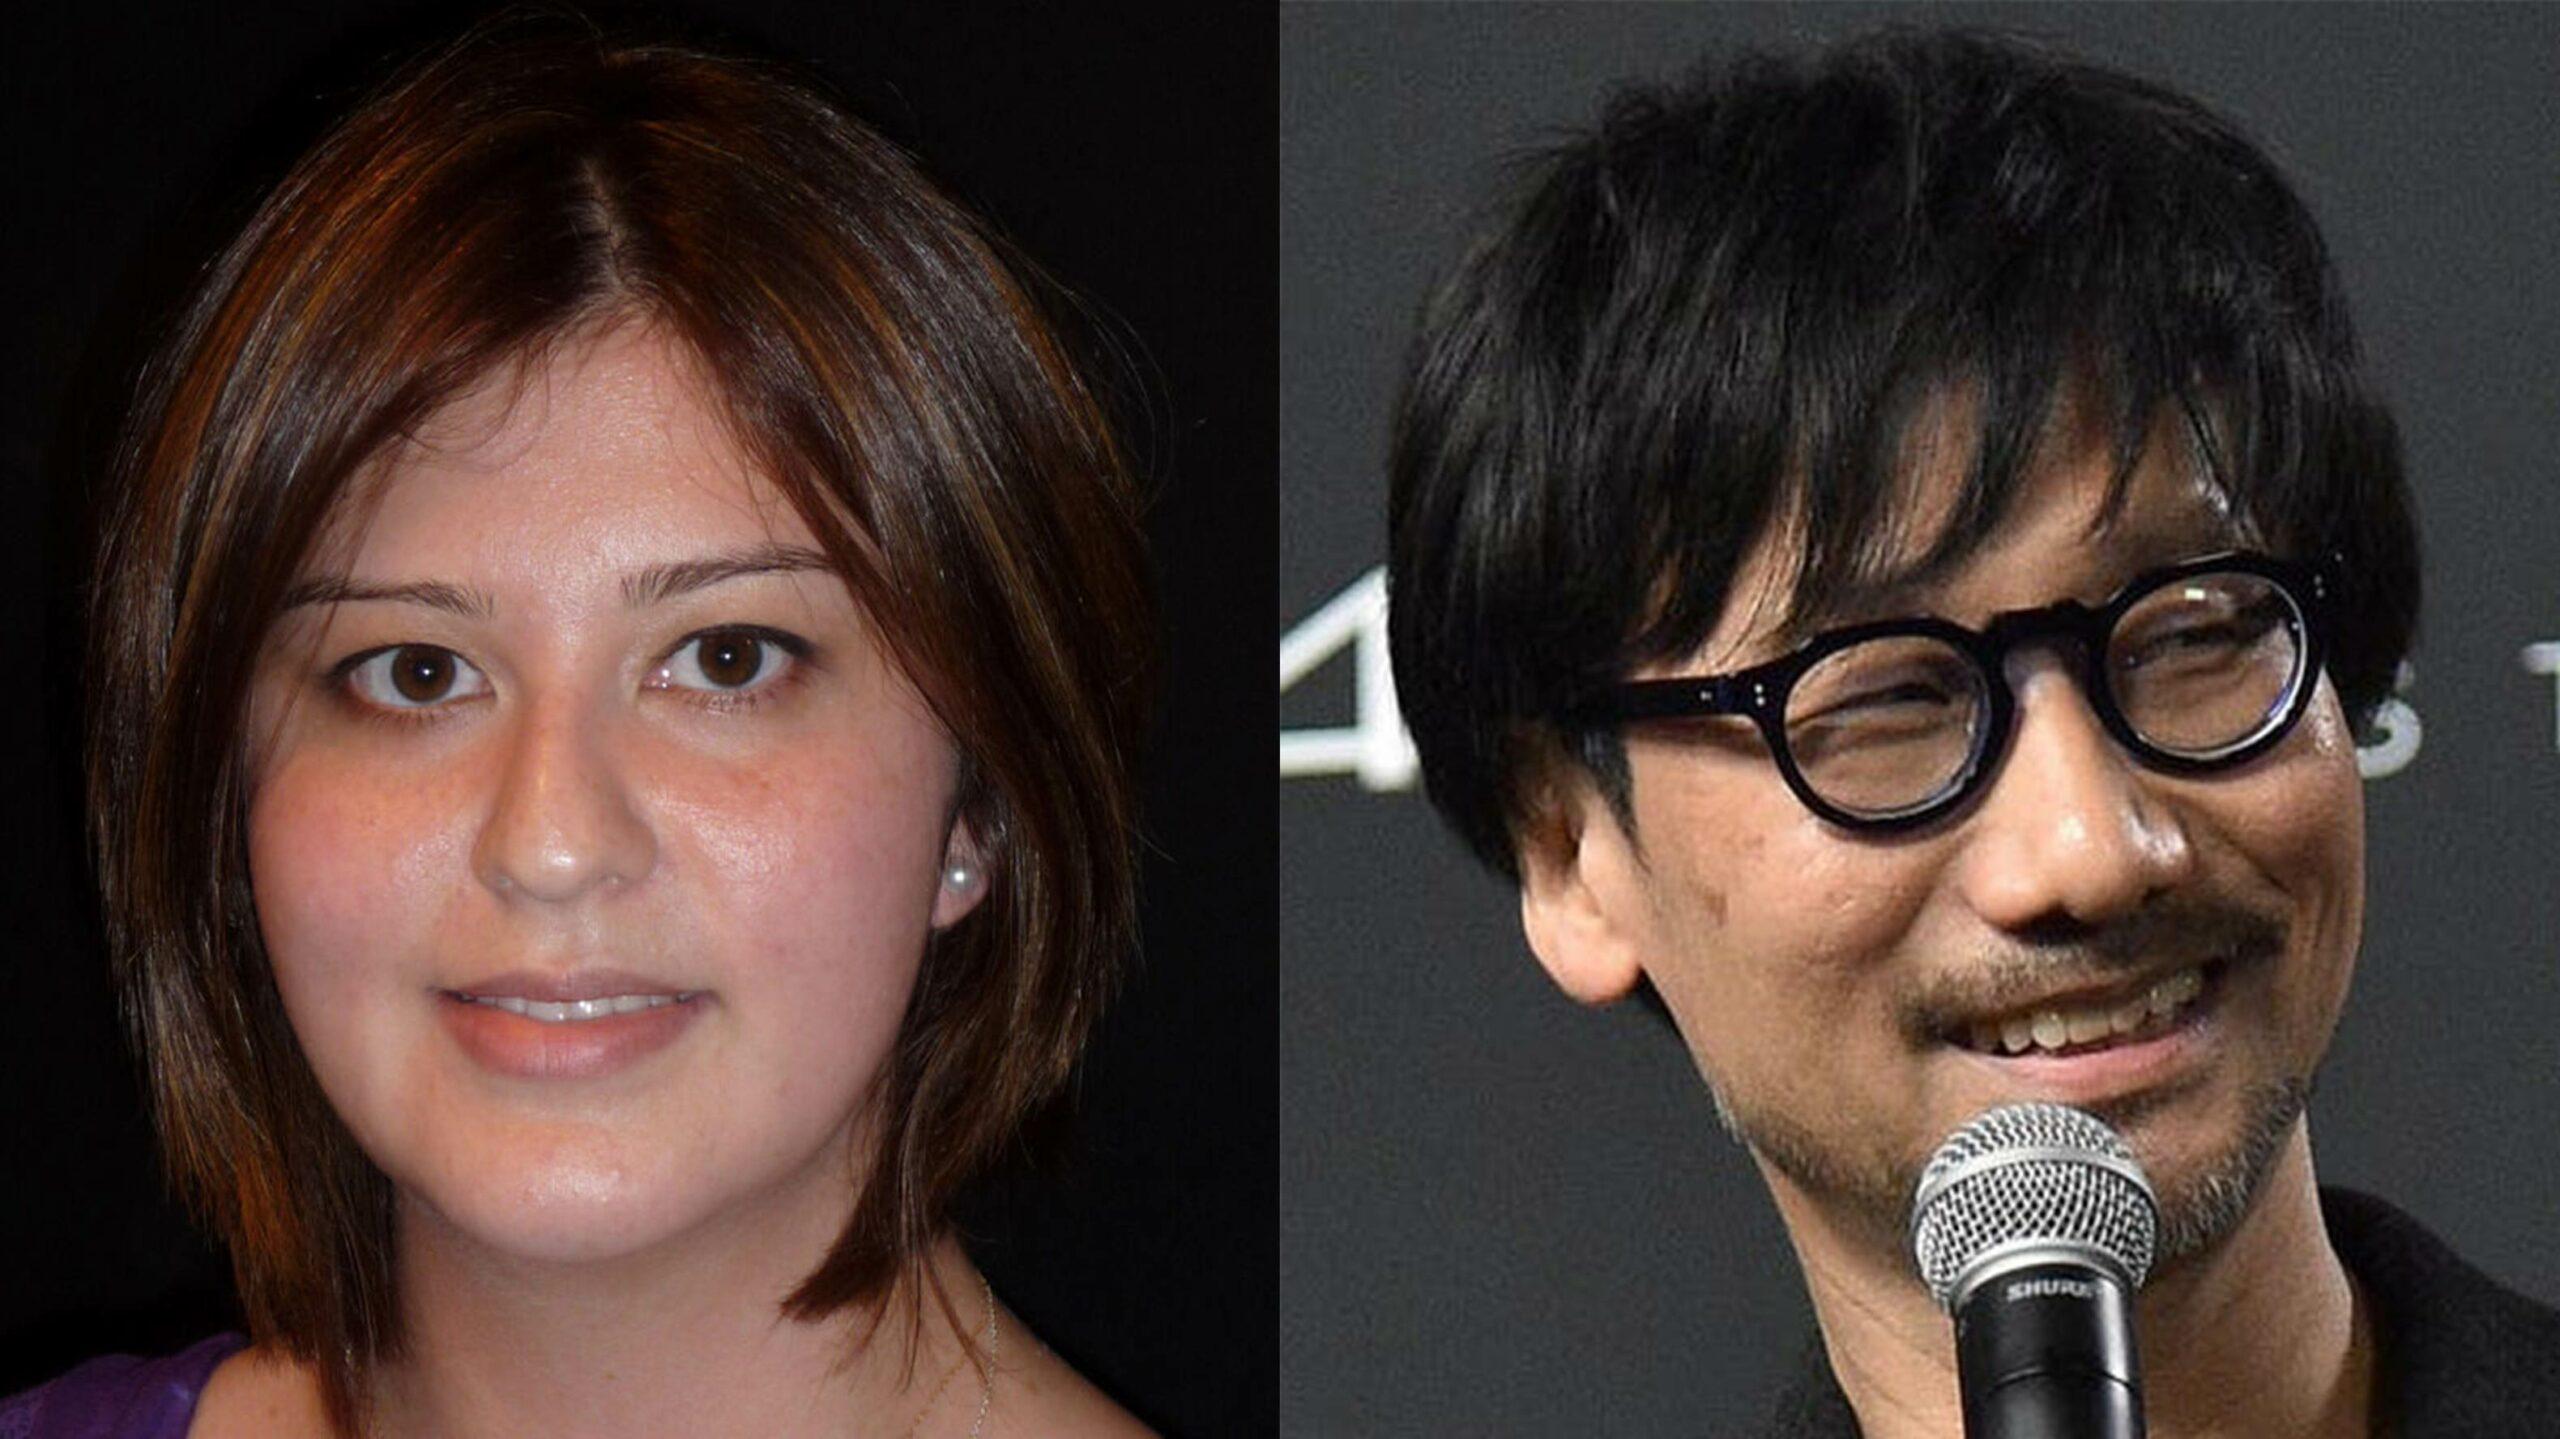 Kim Swift and Hideo Kojima